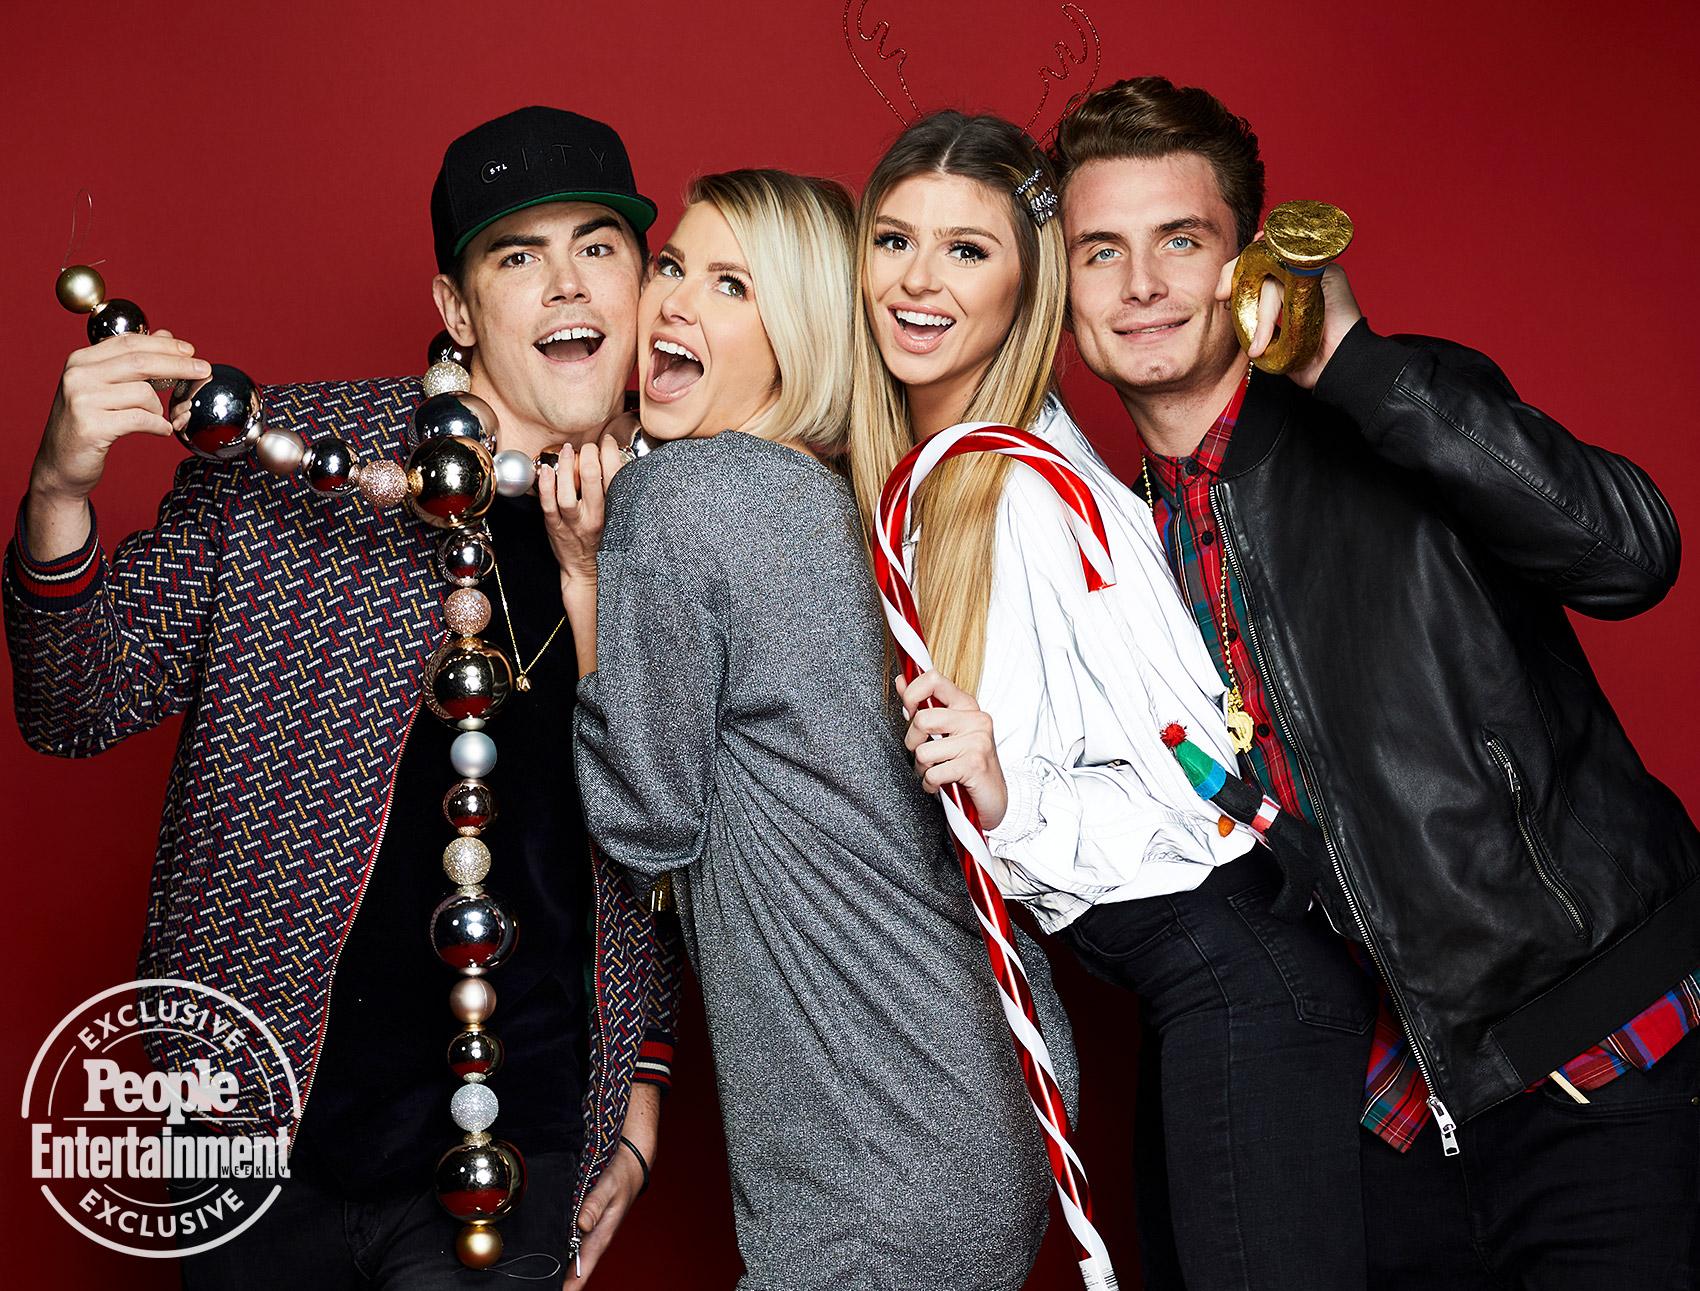 People Portrait Booth at 2018 KIIS-FM Jingle Ball